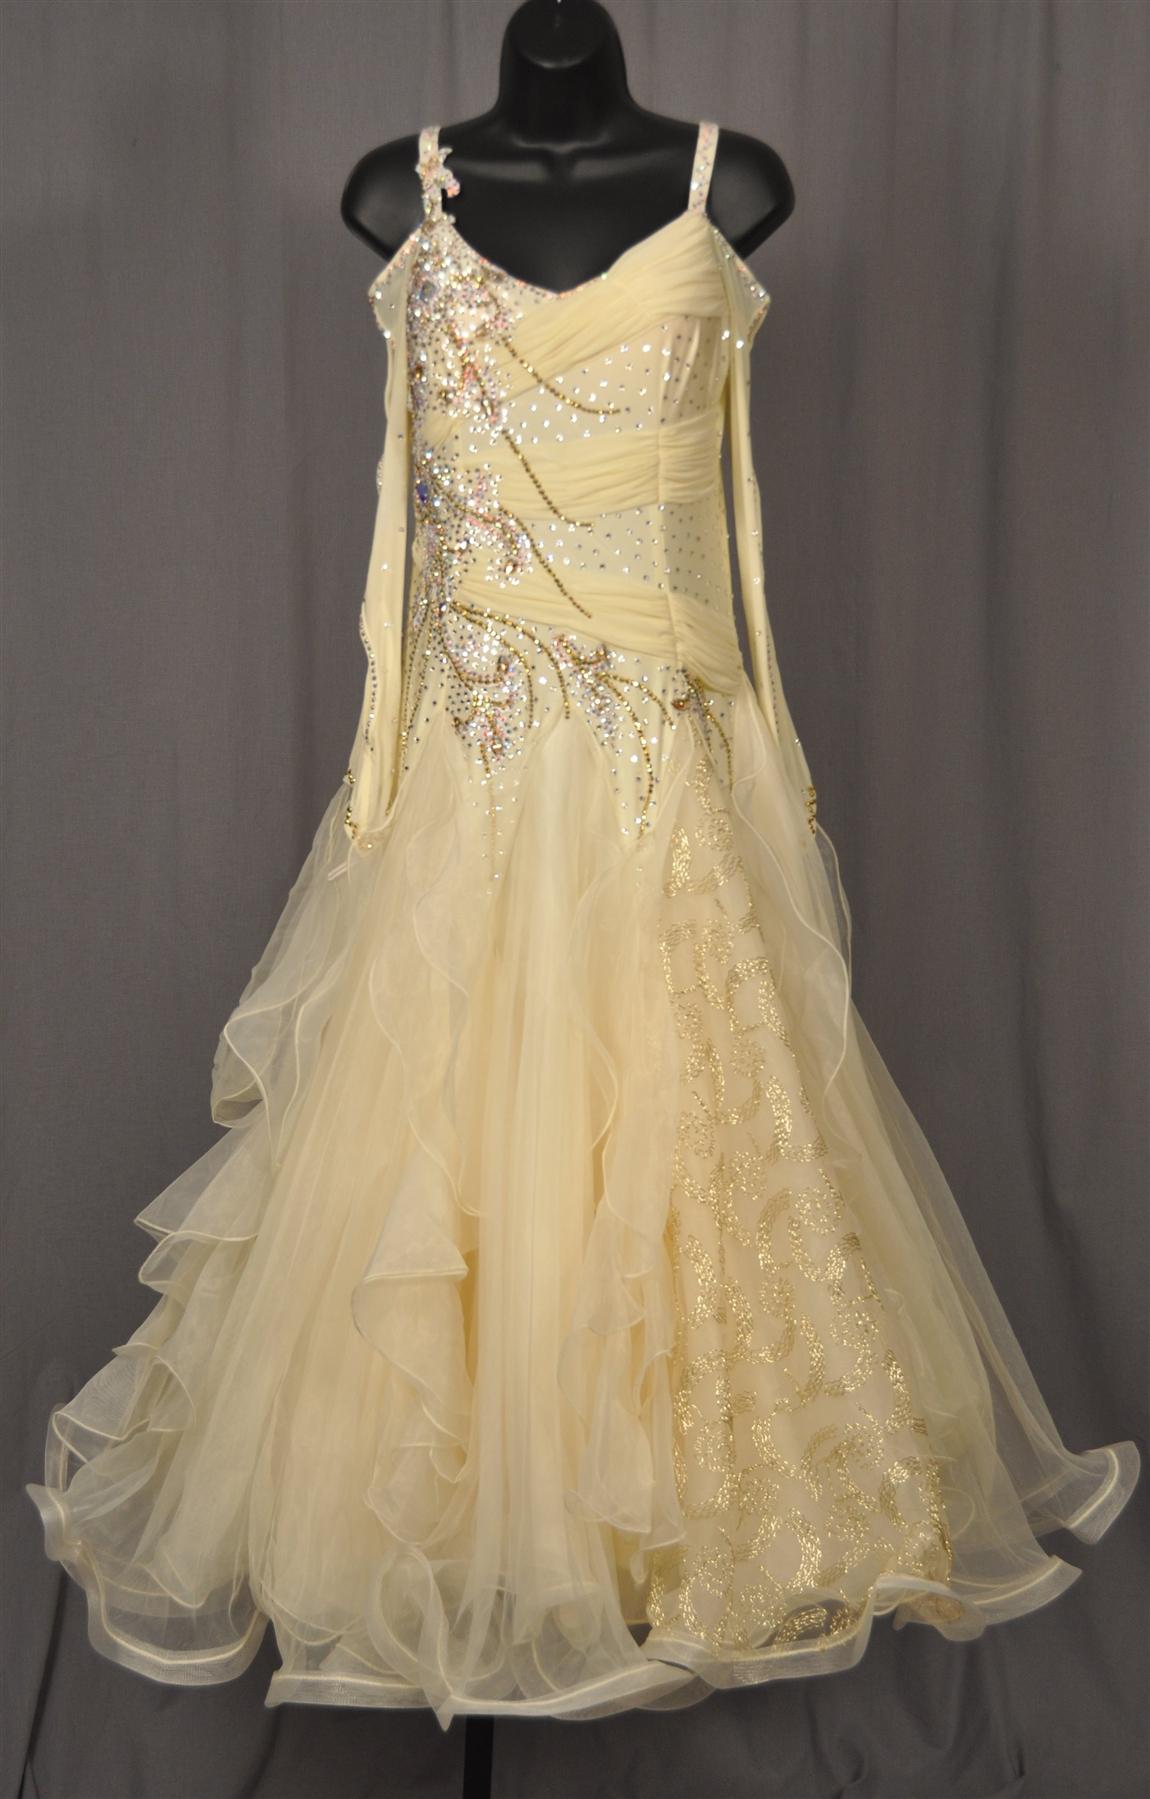 Elegant Long Key Hole Mesh Sleeves Peach Gold Ballroom Dress